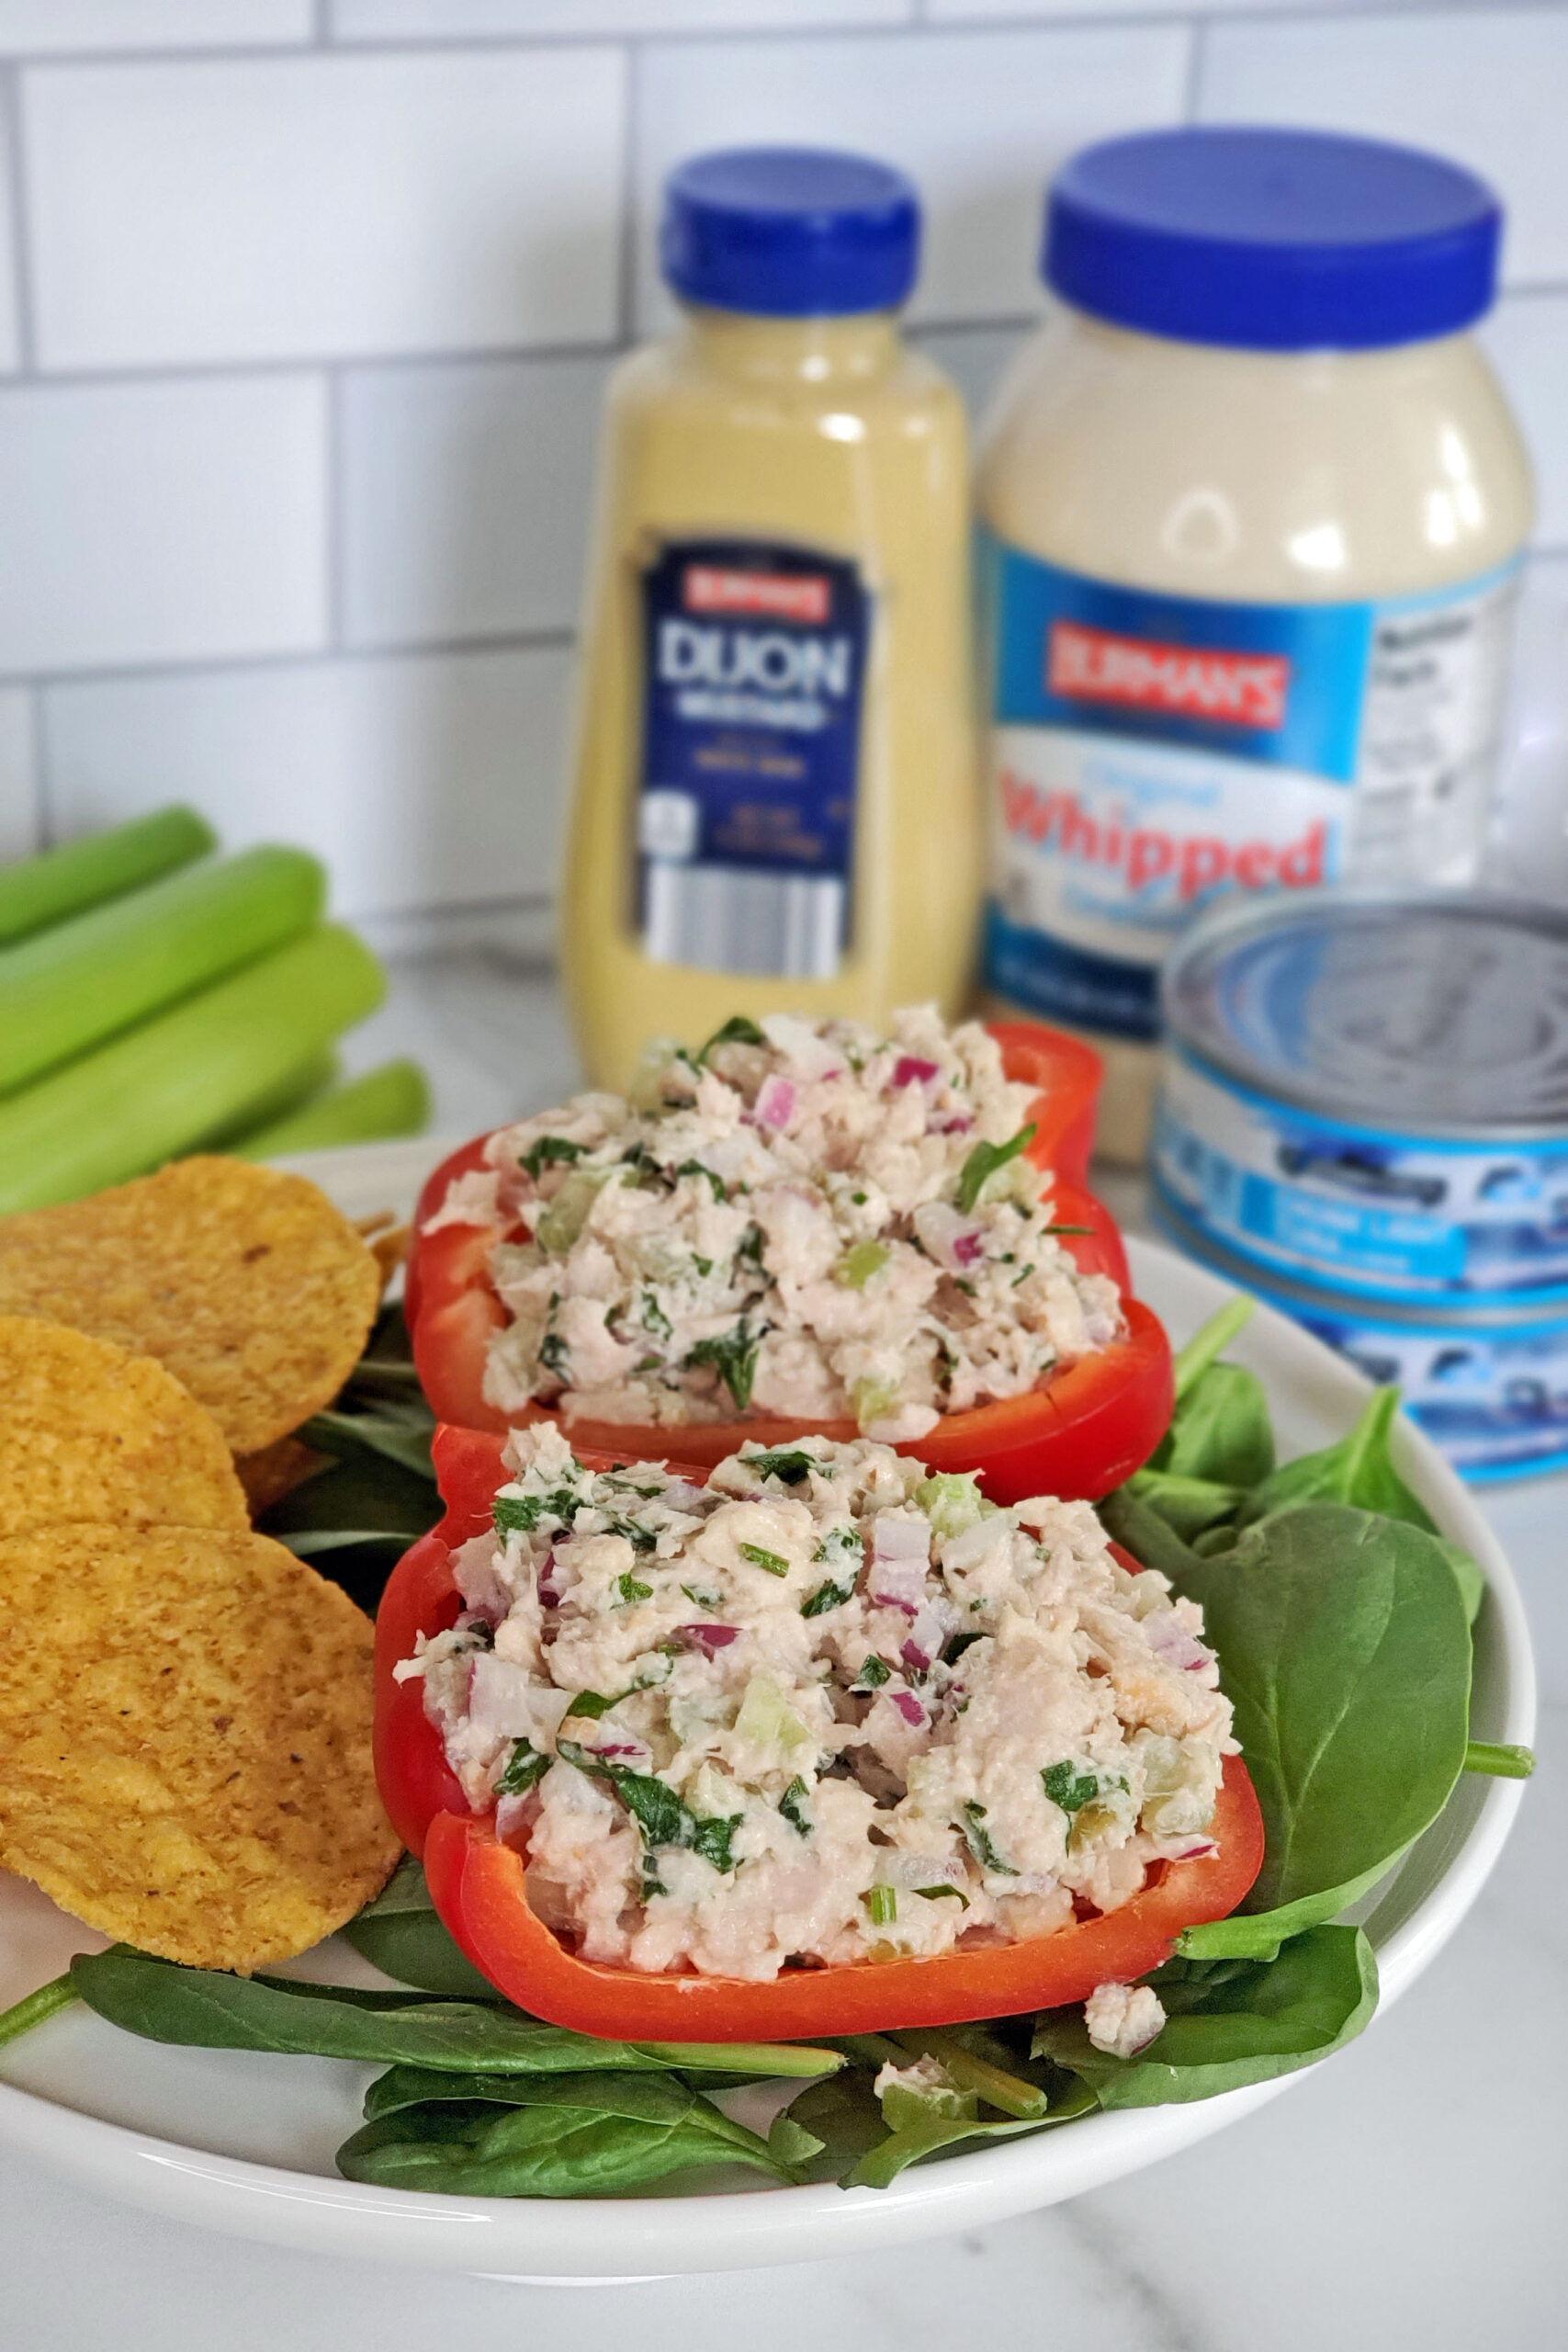 aldi tuna salad stuffed bell pepper boats burman's mayonaise and dijon mustard